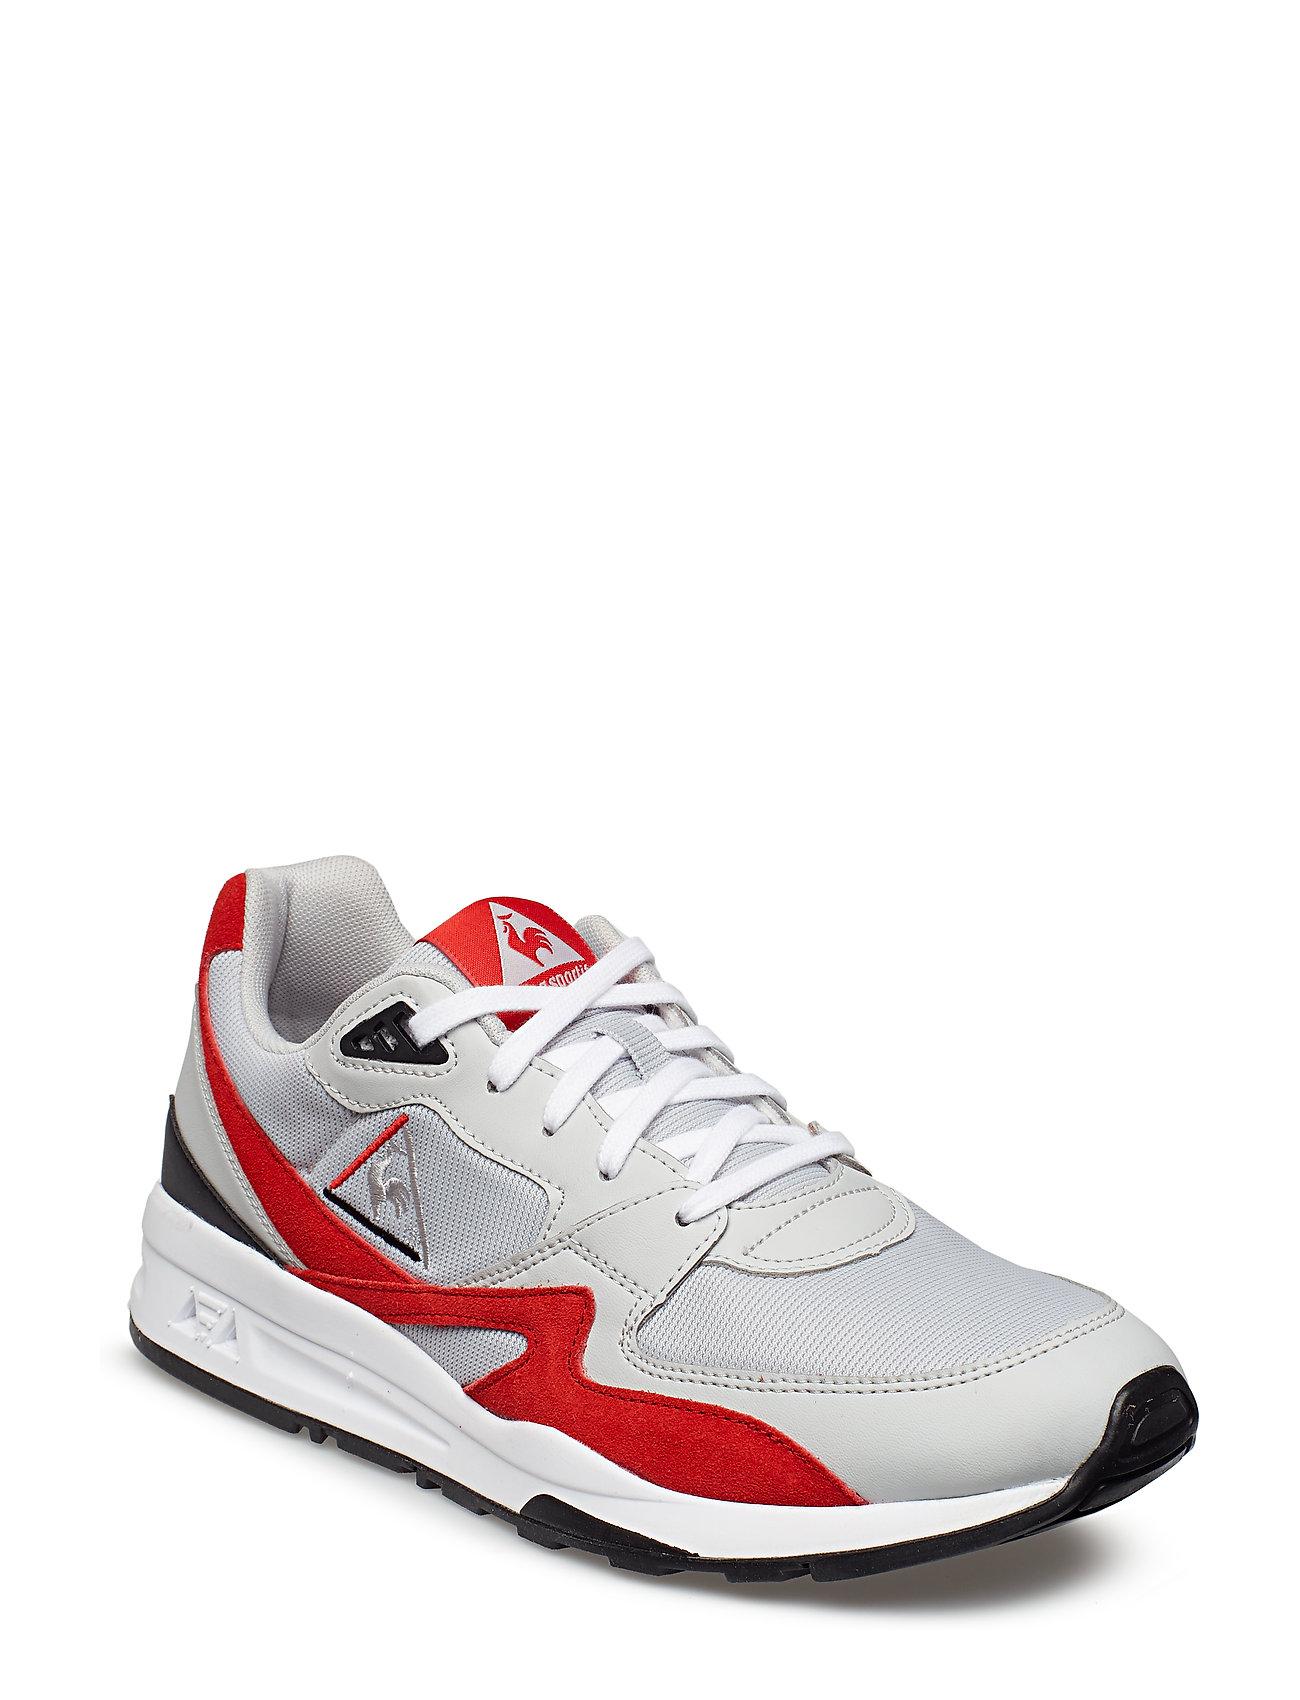 Image of Lcs R800 Low-top Sneakers Hvid Le Coq Sportif (3105942745)